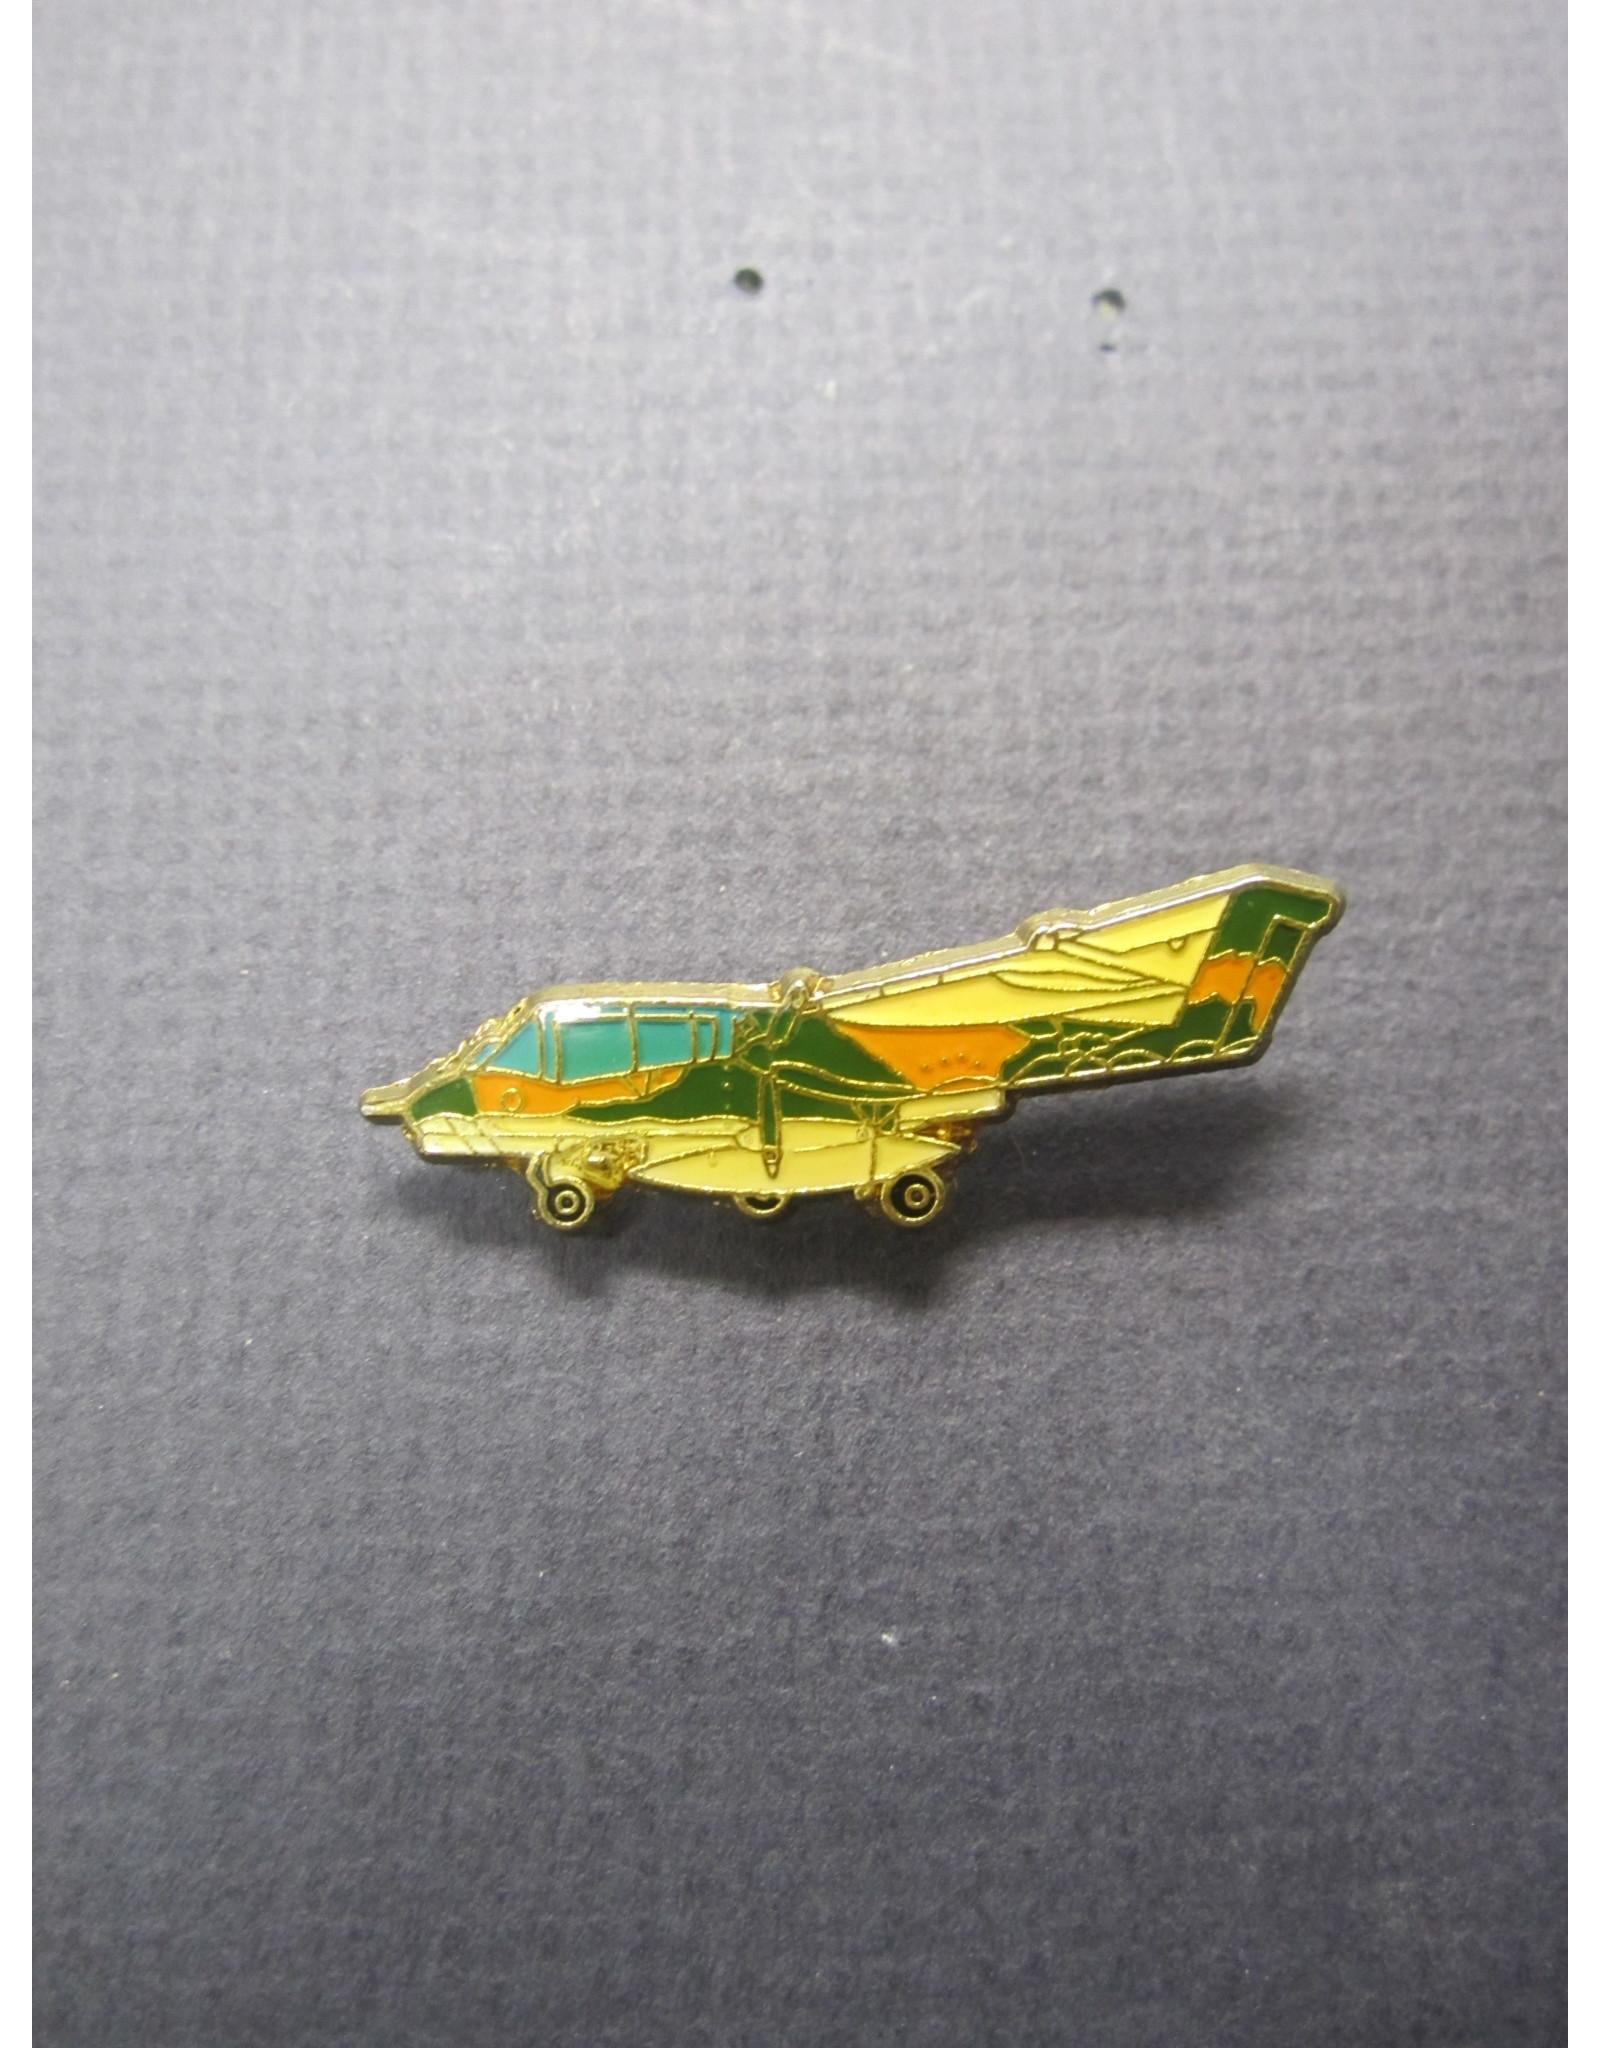 Enamel Camouflage OV-10 pin, Green, orange, white